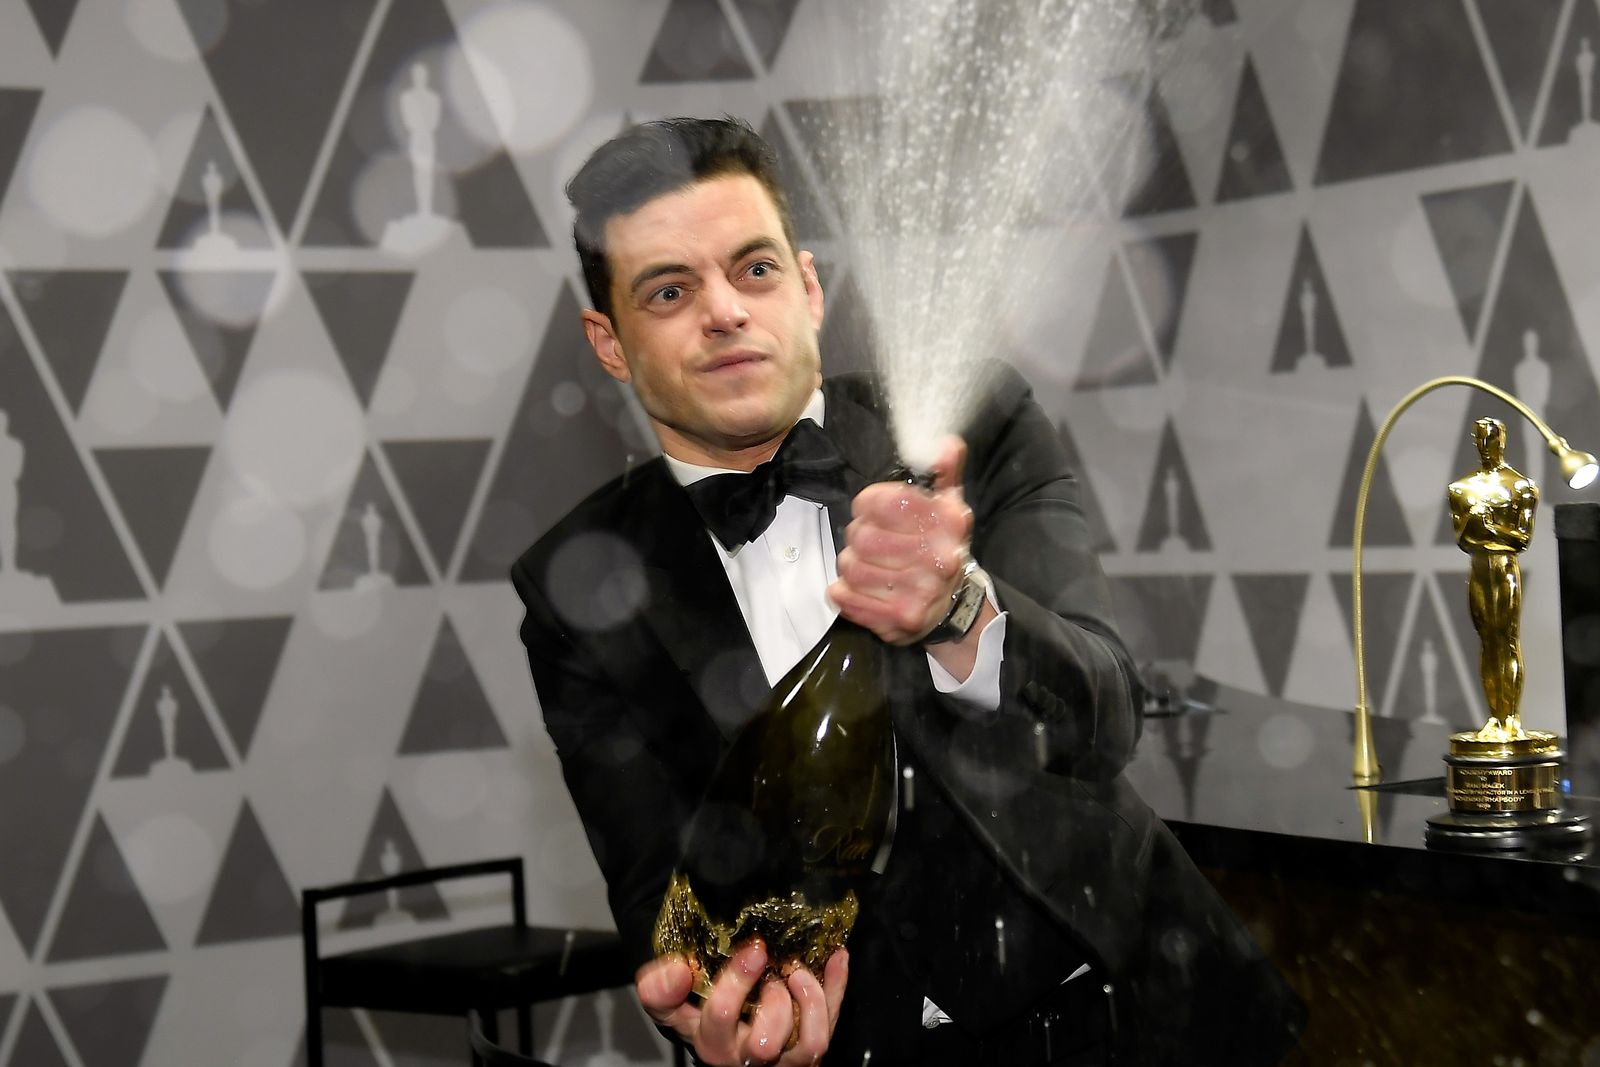 James Bond 25/ Rami Malek